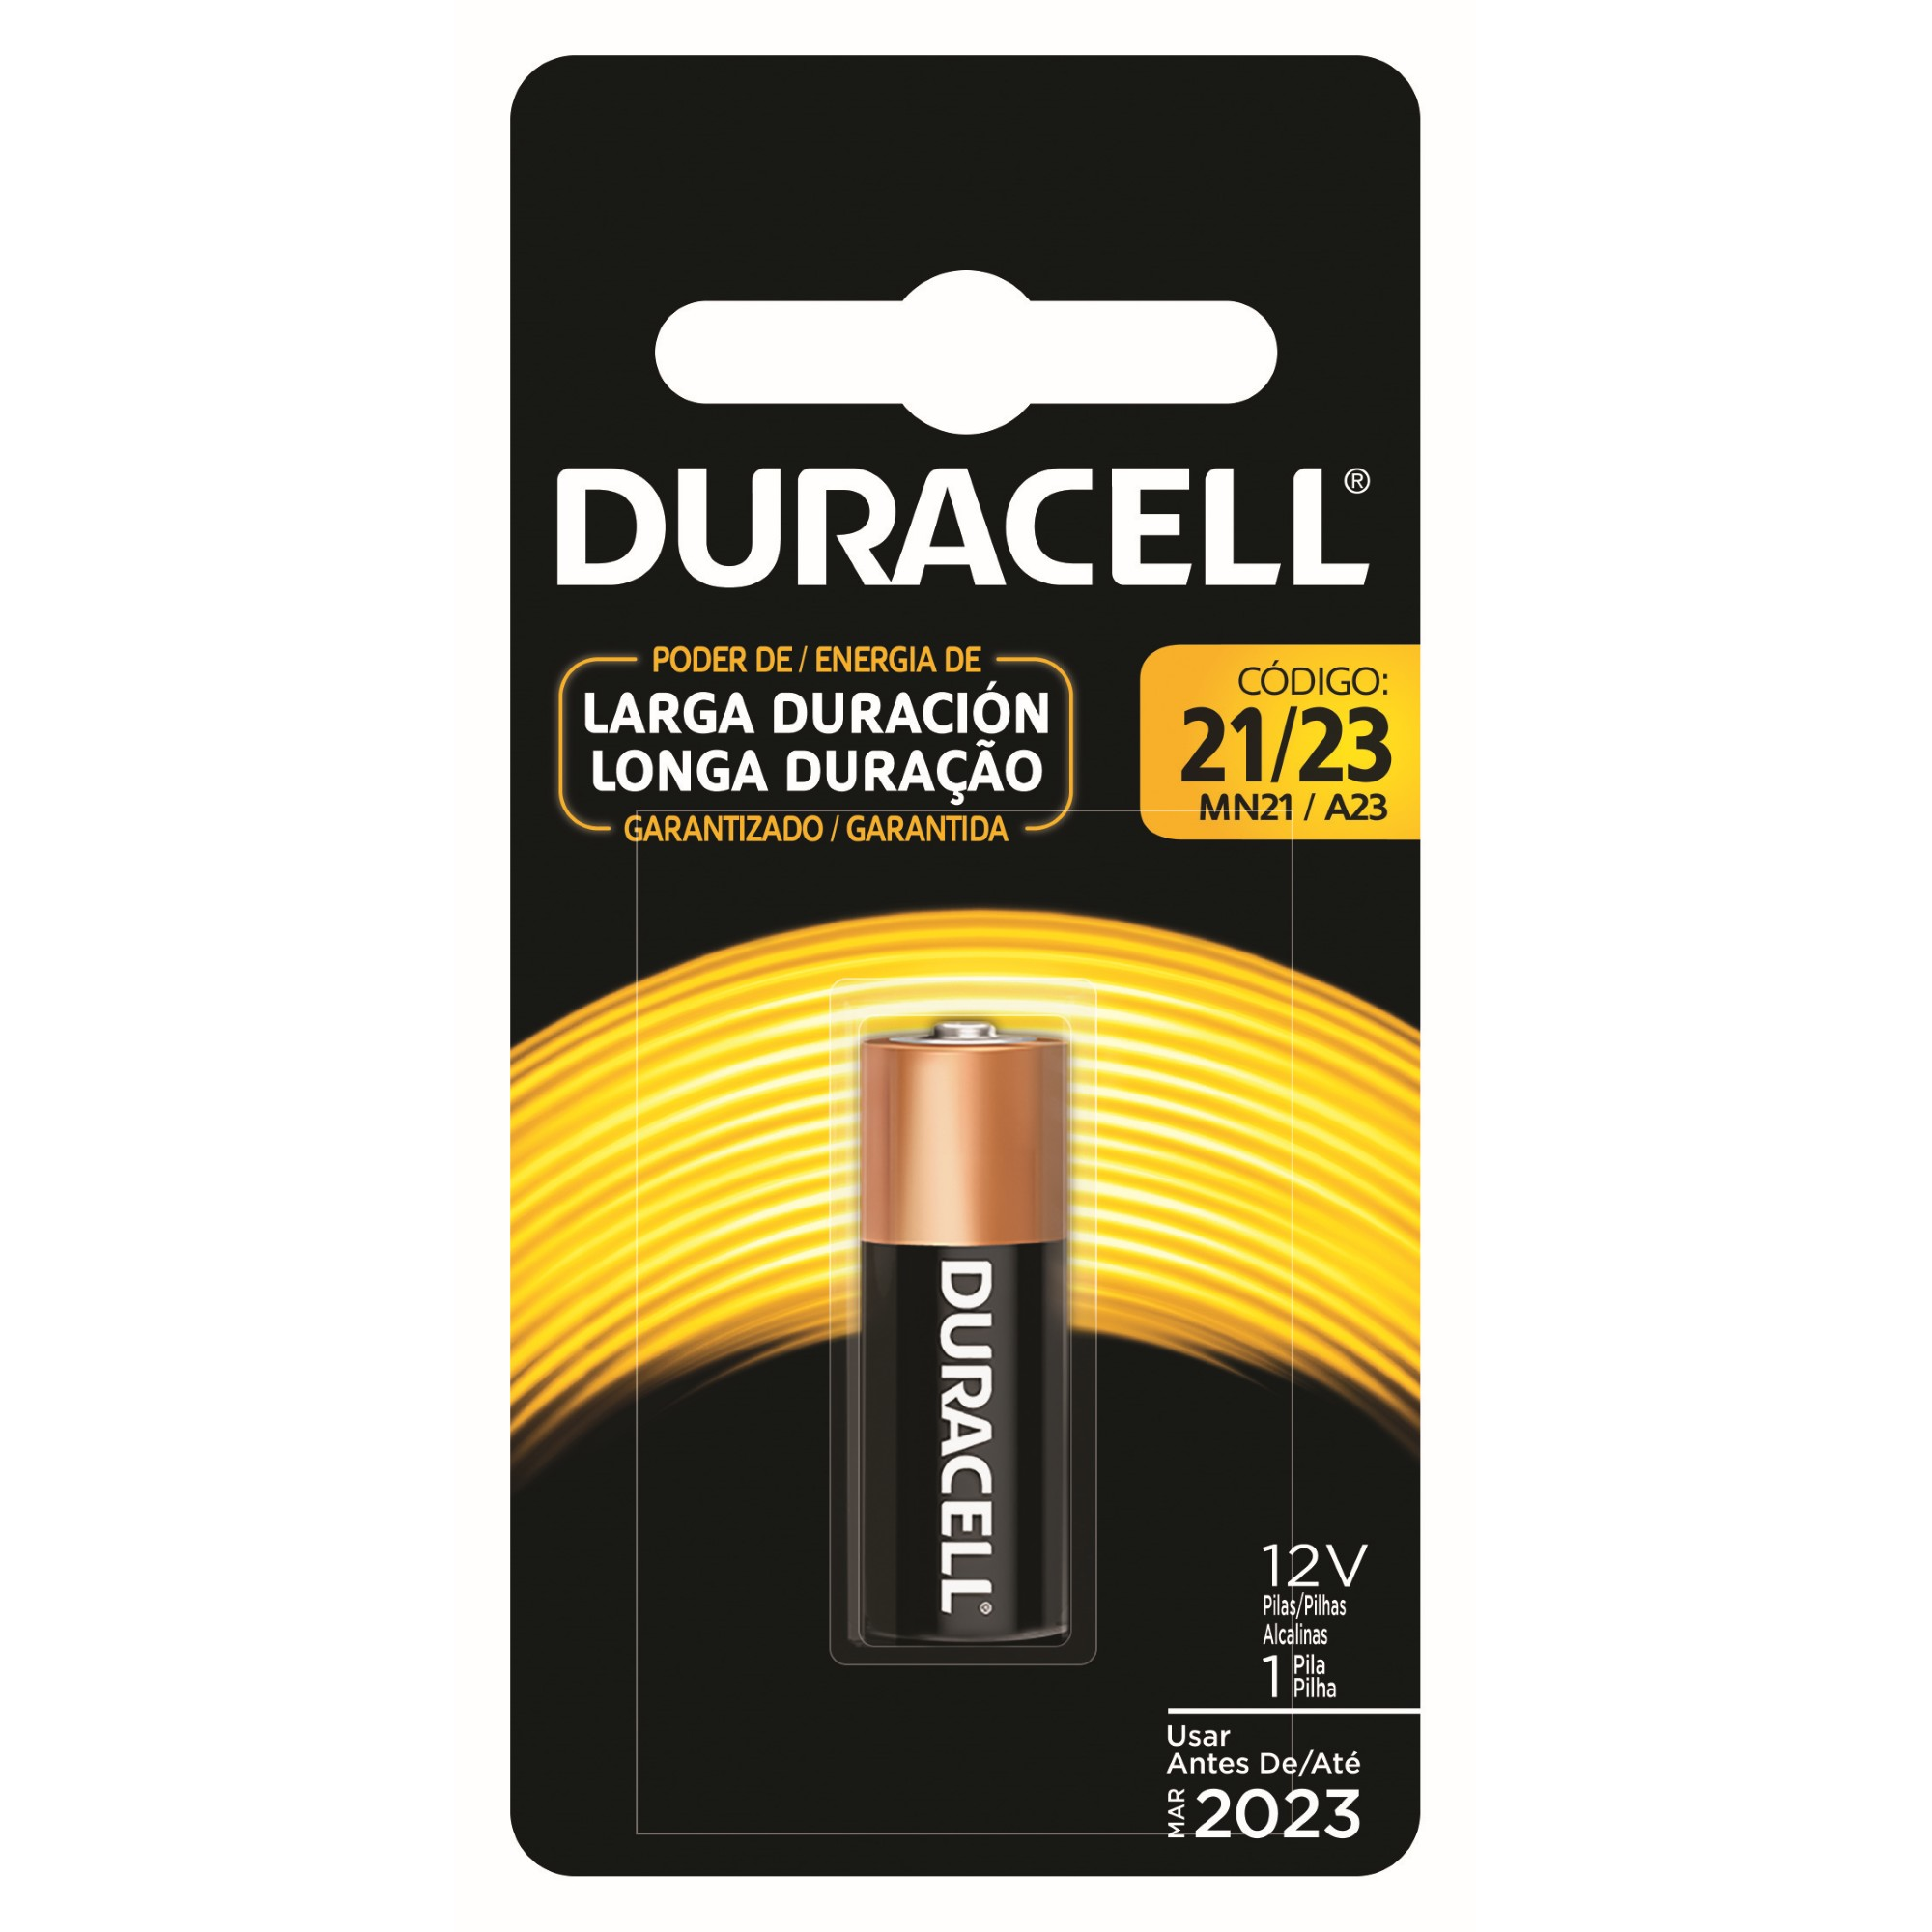 Pillha Alcalina Duracel 12V 1 Unidade 30080